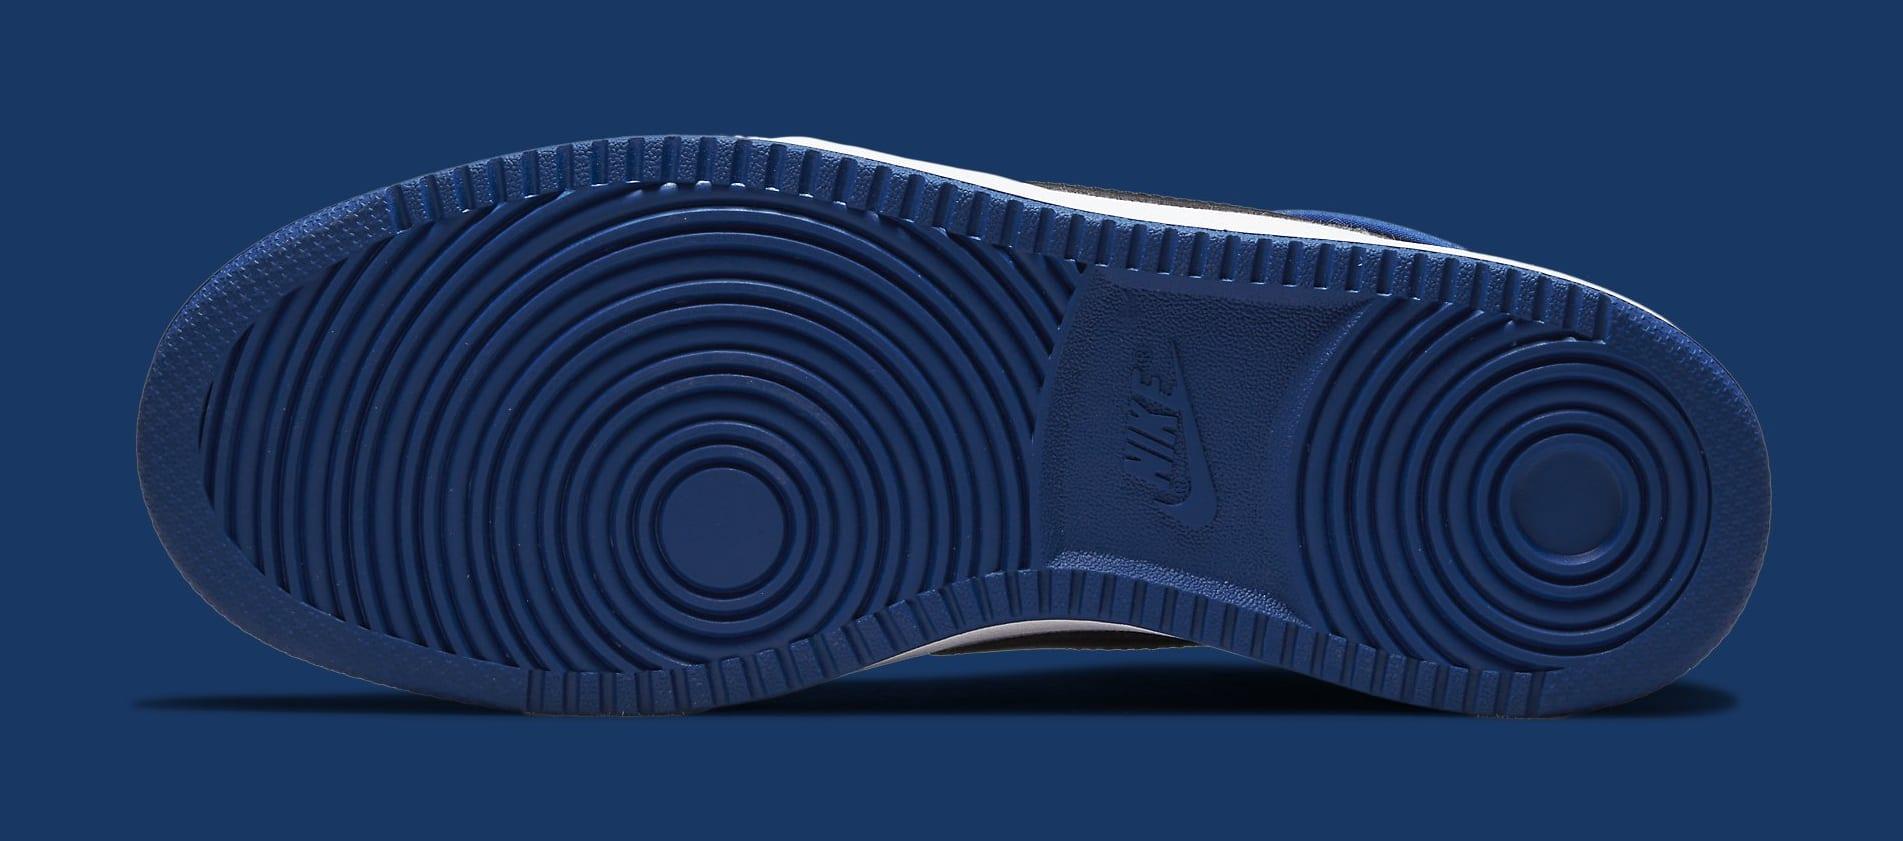 Air Jordan 1 KO 'Storm Blue' DO5047-401 Outsole